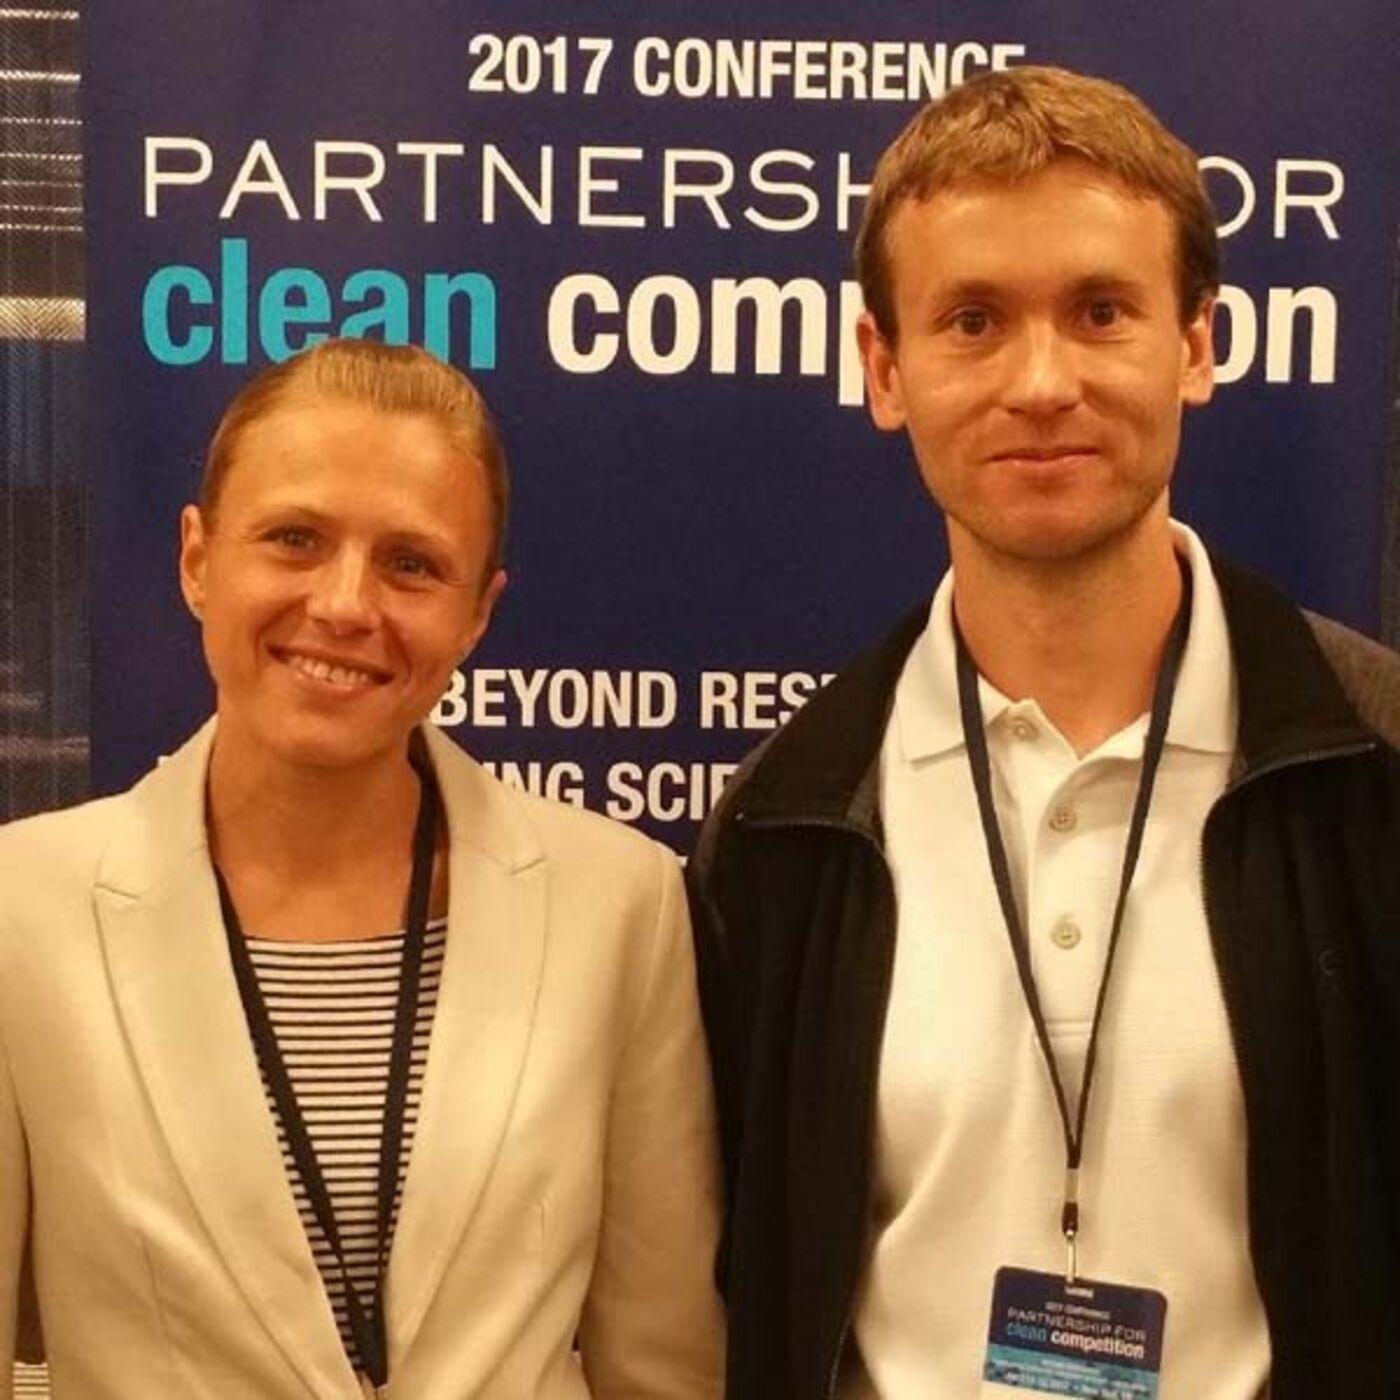 Ep 249 - Russian doping whistleblowers Yuliya and Vitaly Stepanov (Part 1)